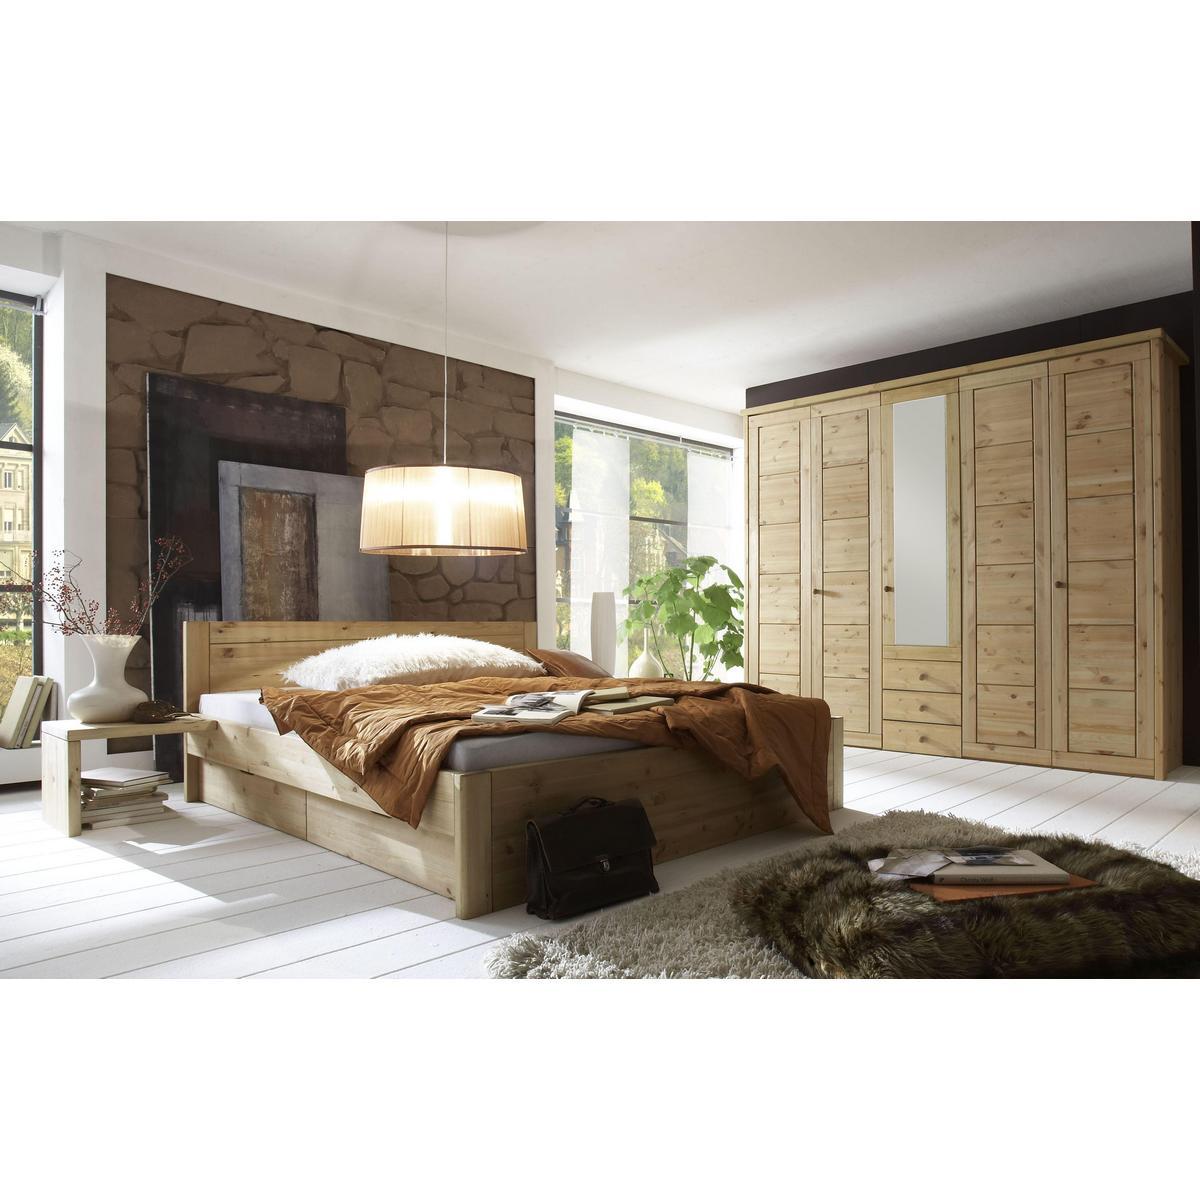 Doppelbett mit schubladen 160x200 rauna xl kiefer massiv for Funktionsbett 160x200